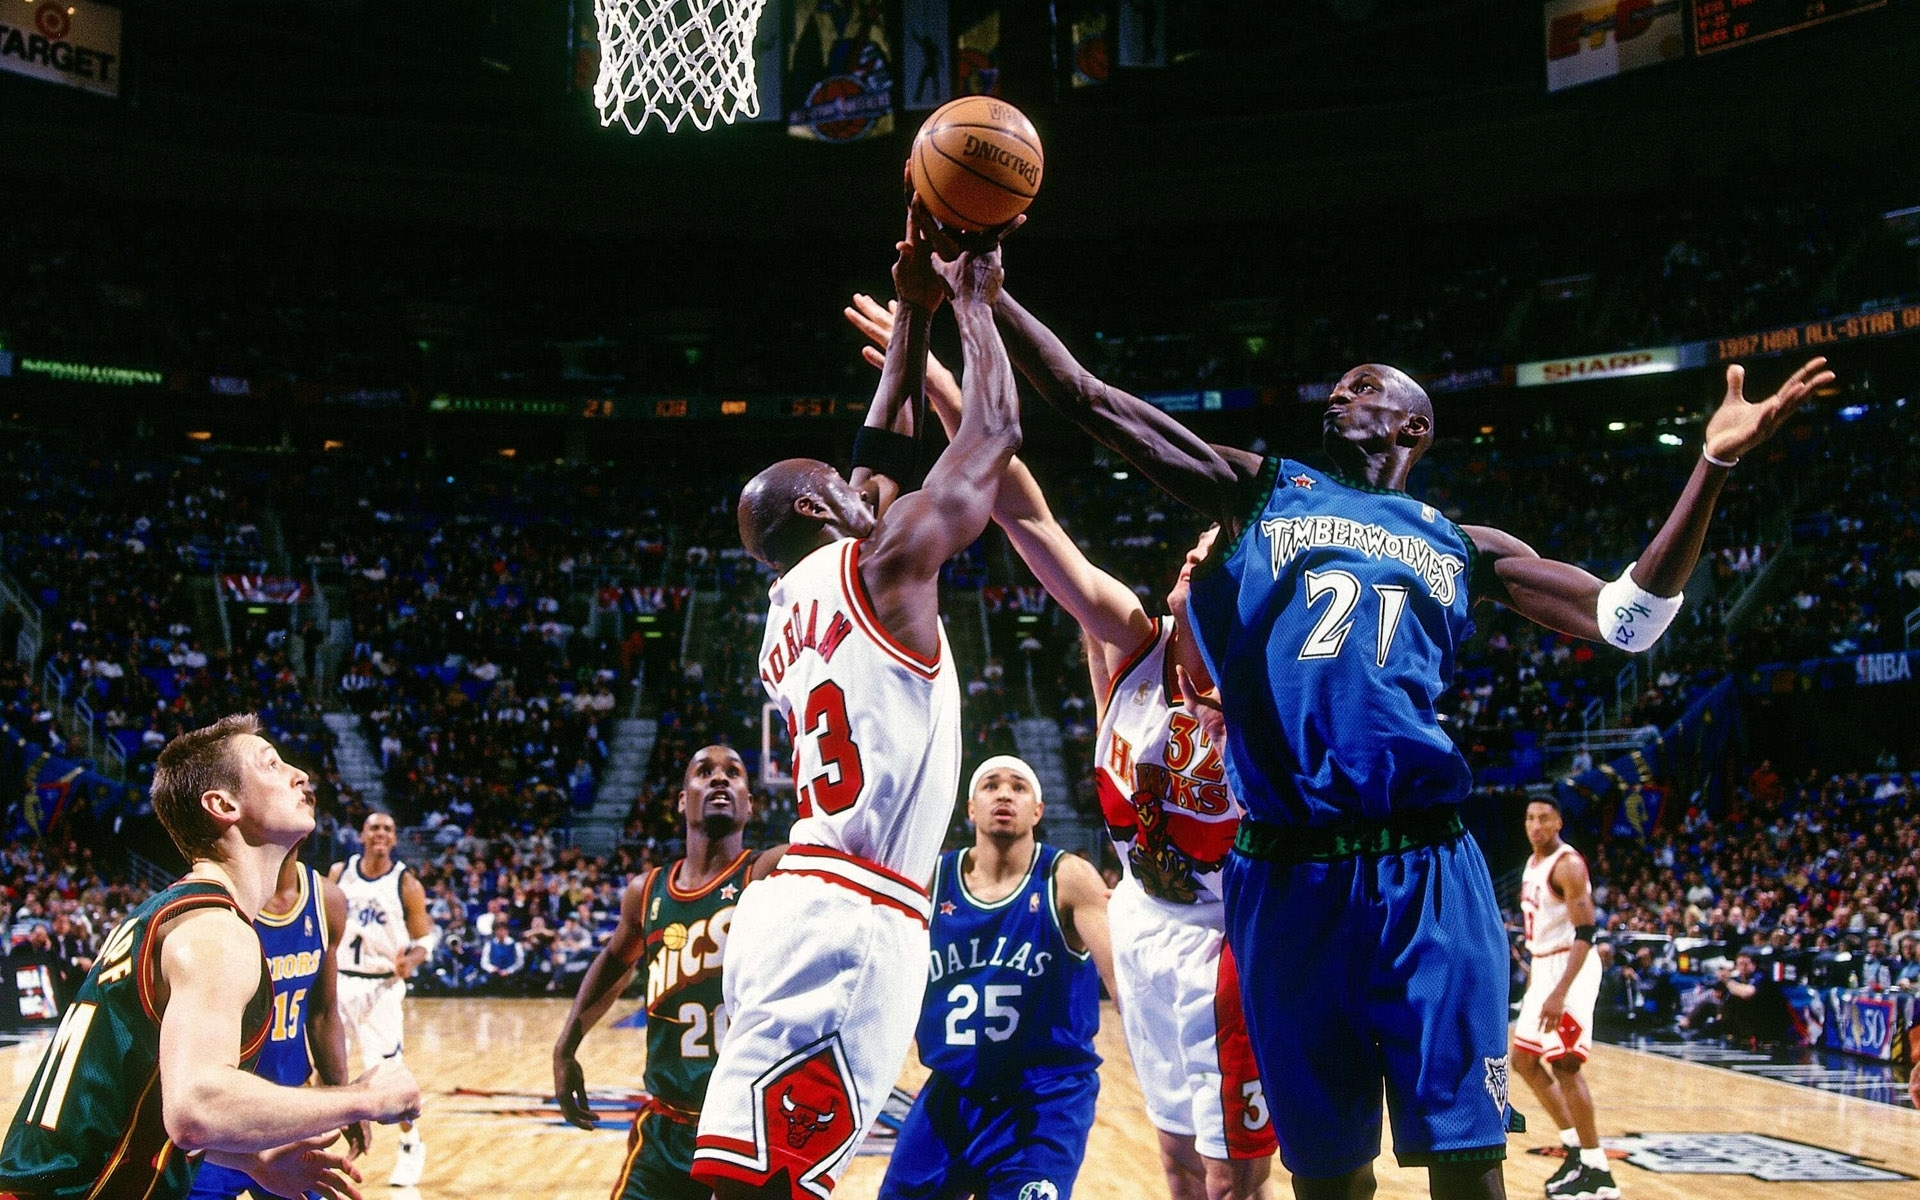 Sports nba basketball michael jordan kevin garnett chicago 1920x1200